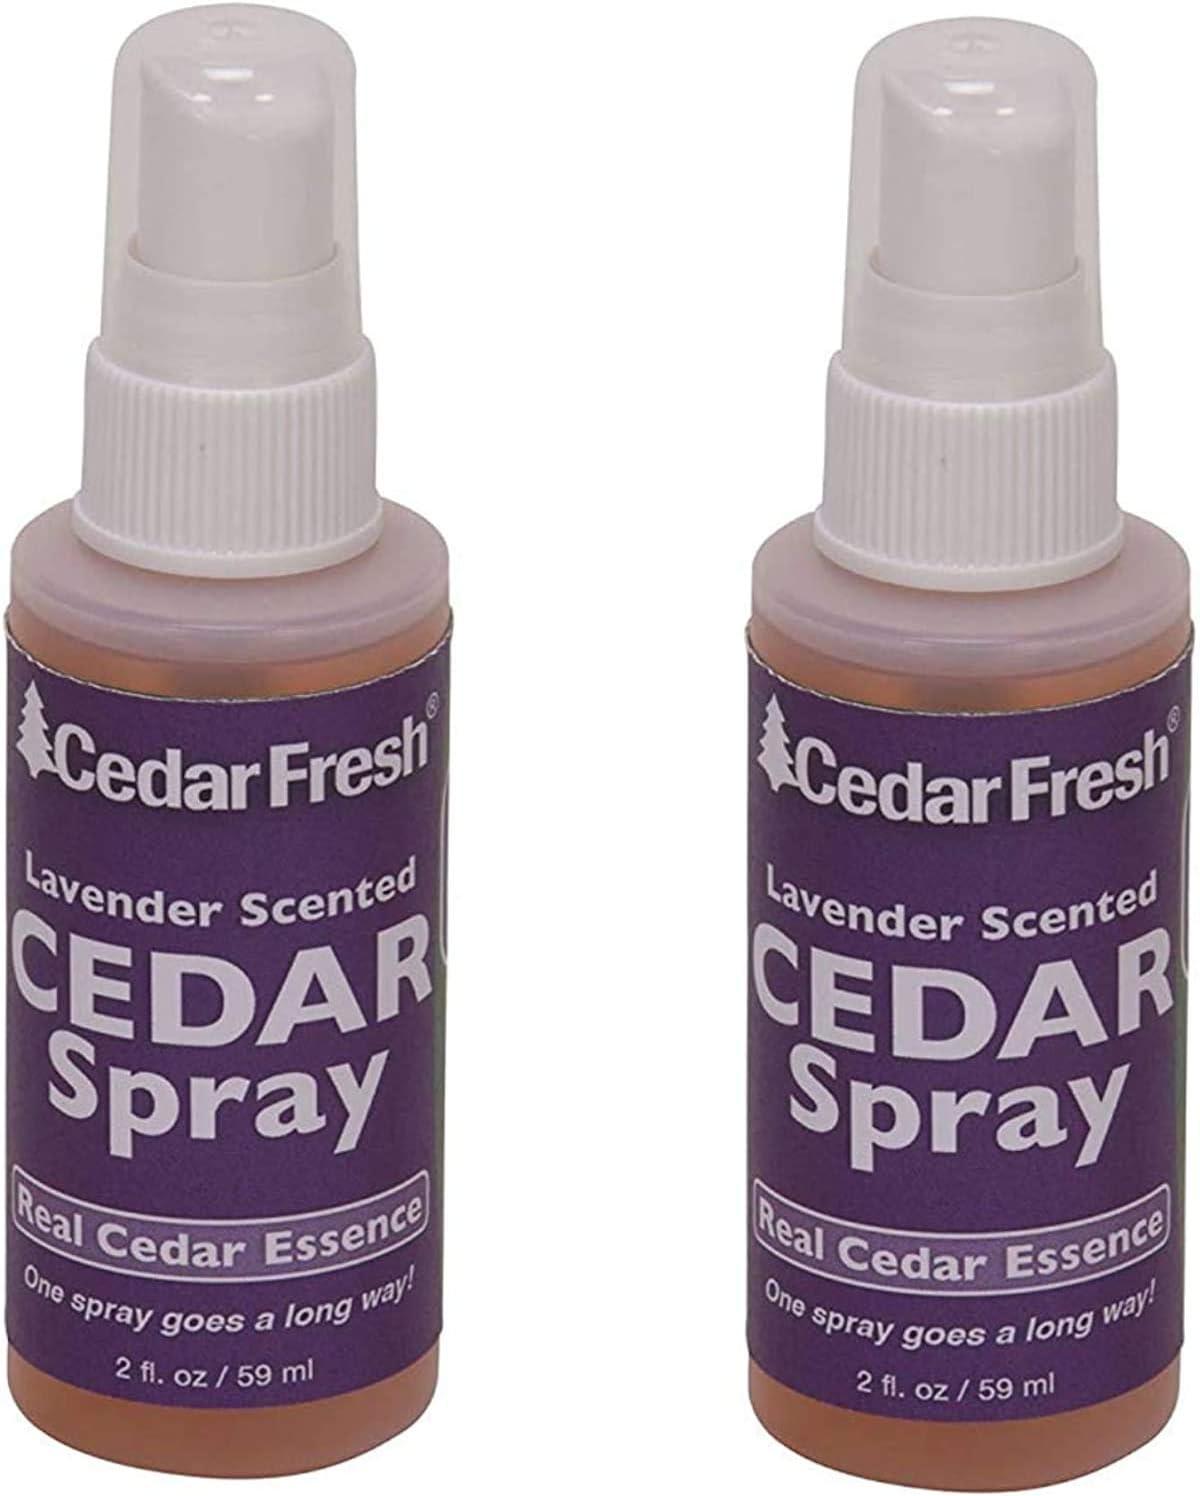 Household Essentials CedarFresh 84802 Cedar Power Spray with Lavender Essence Scent, 2 fl. oz. - 2 Pack